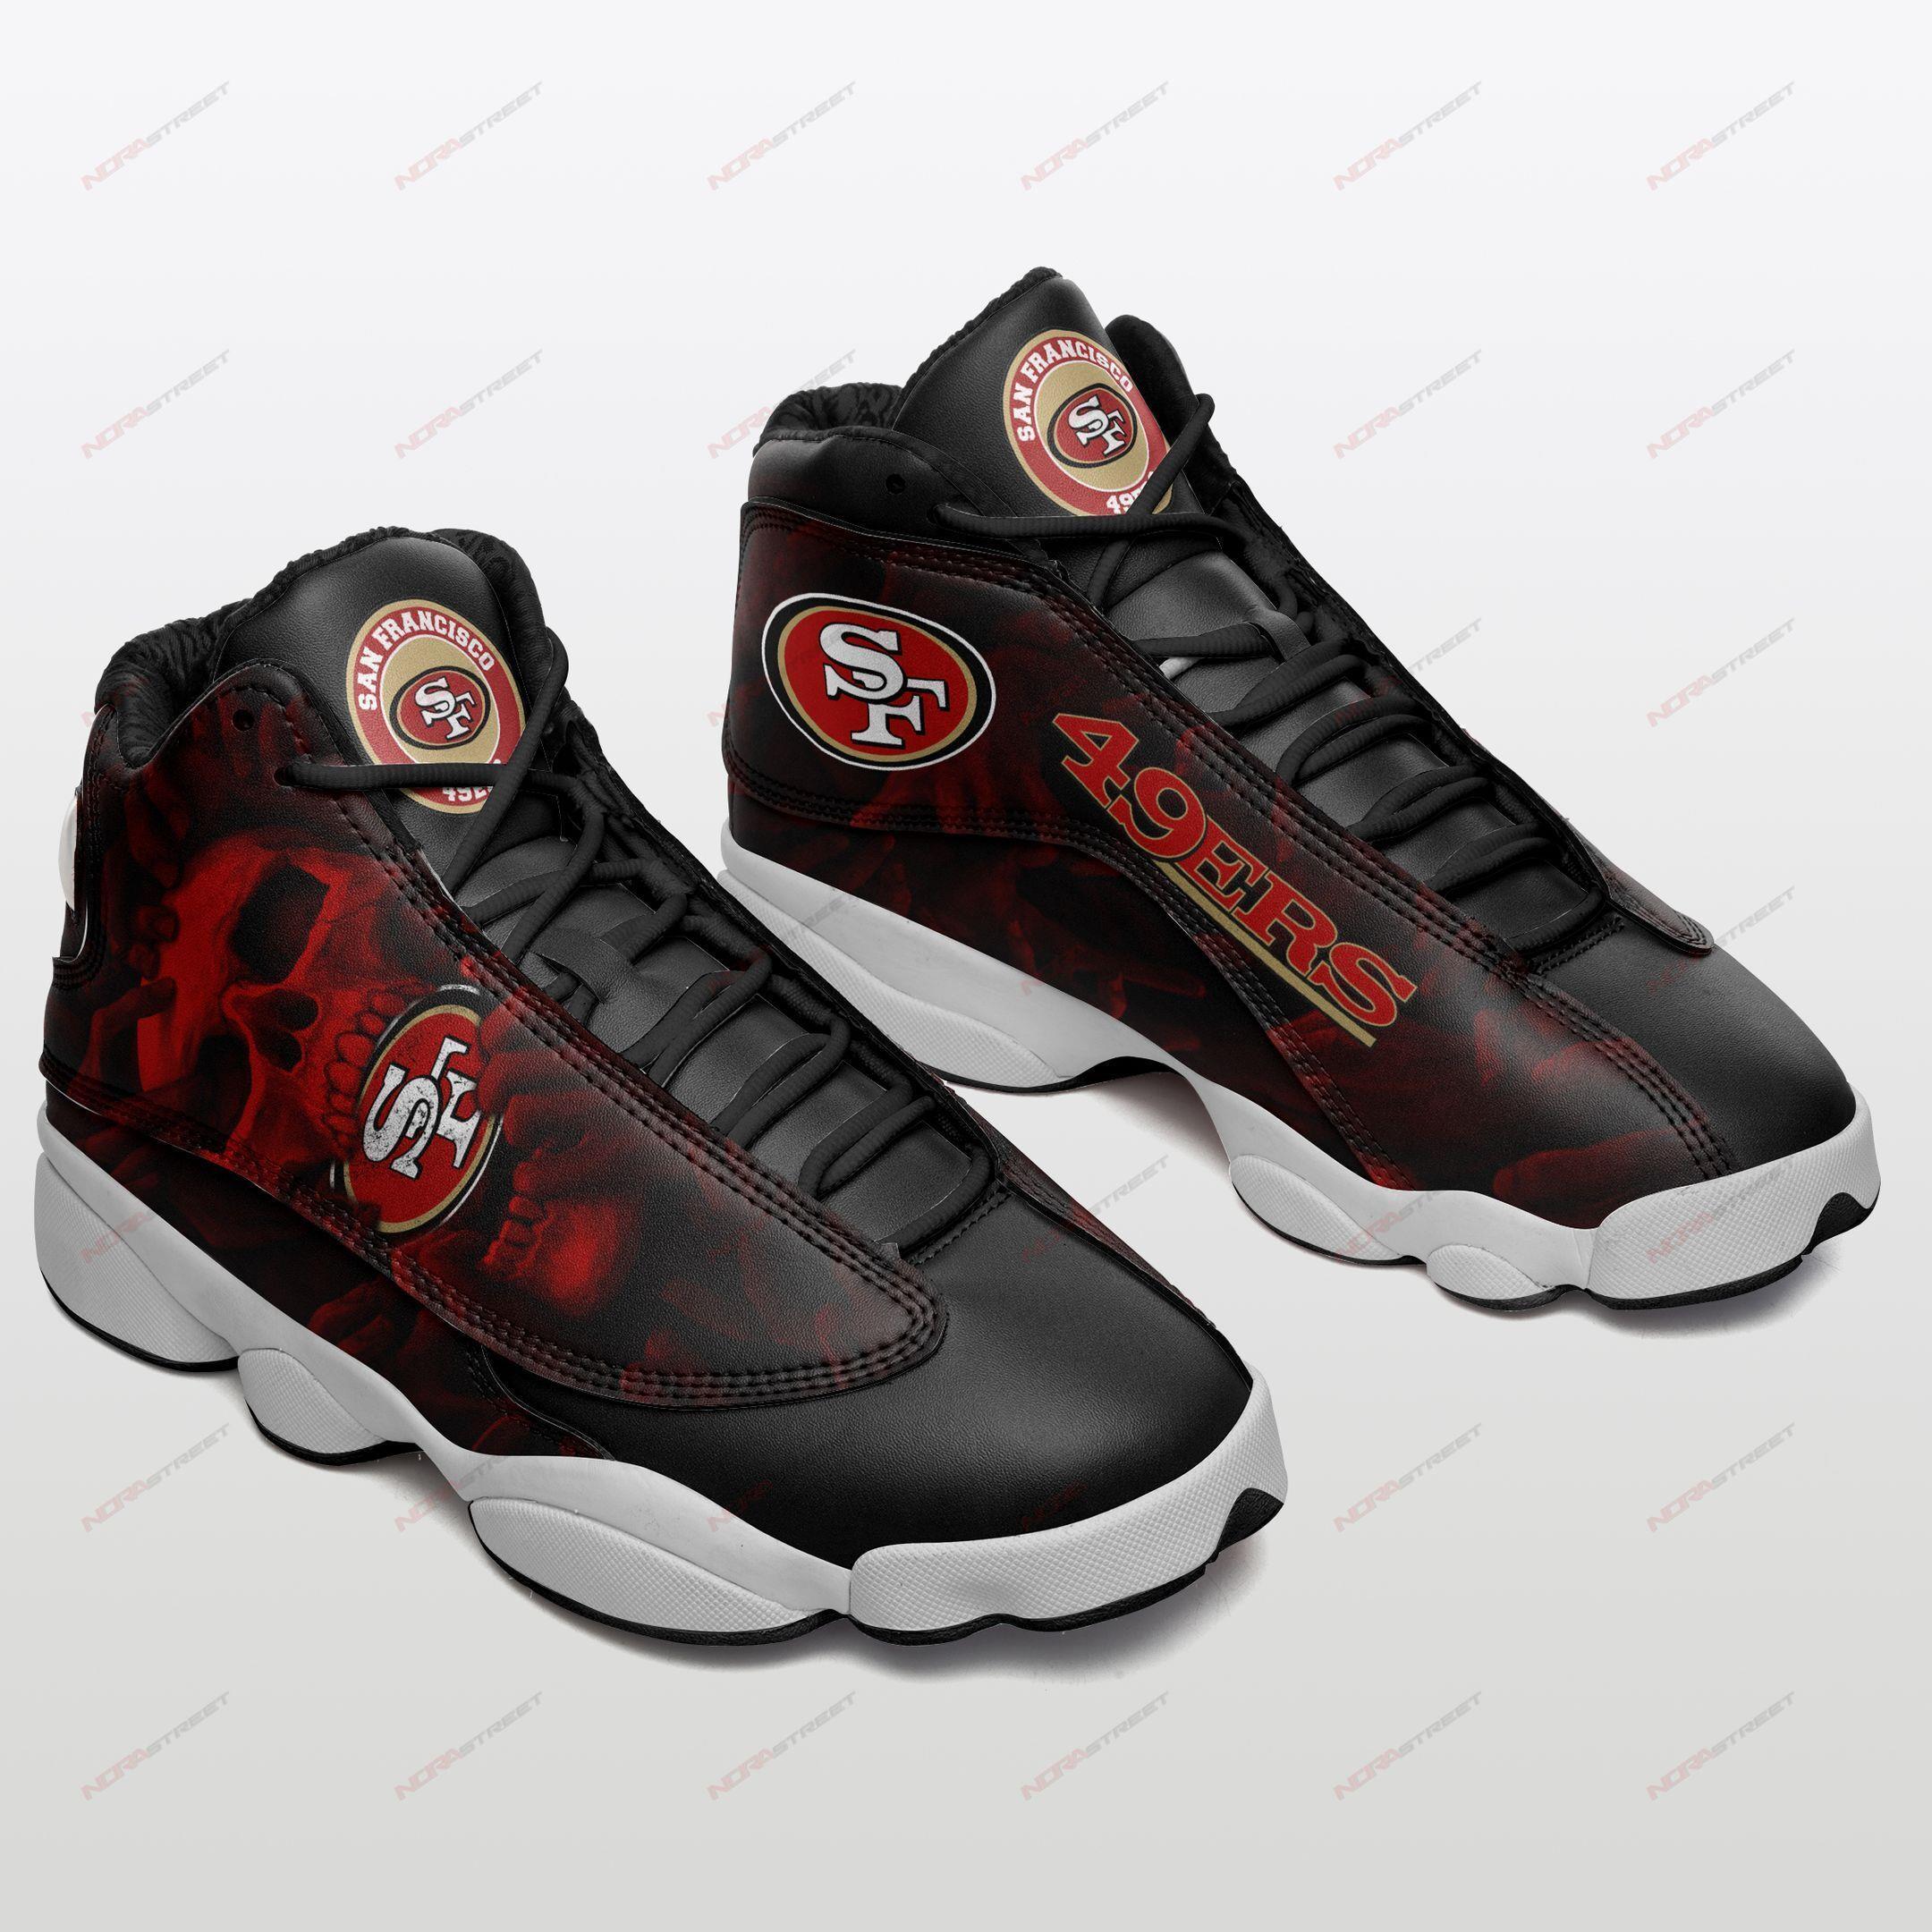 San Francisco 49ers Air Jordan 13 Sneakers Sport Shoes Full Size